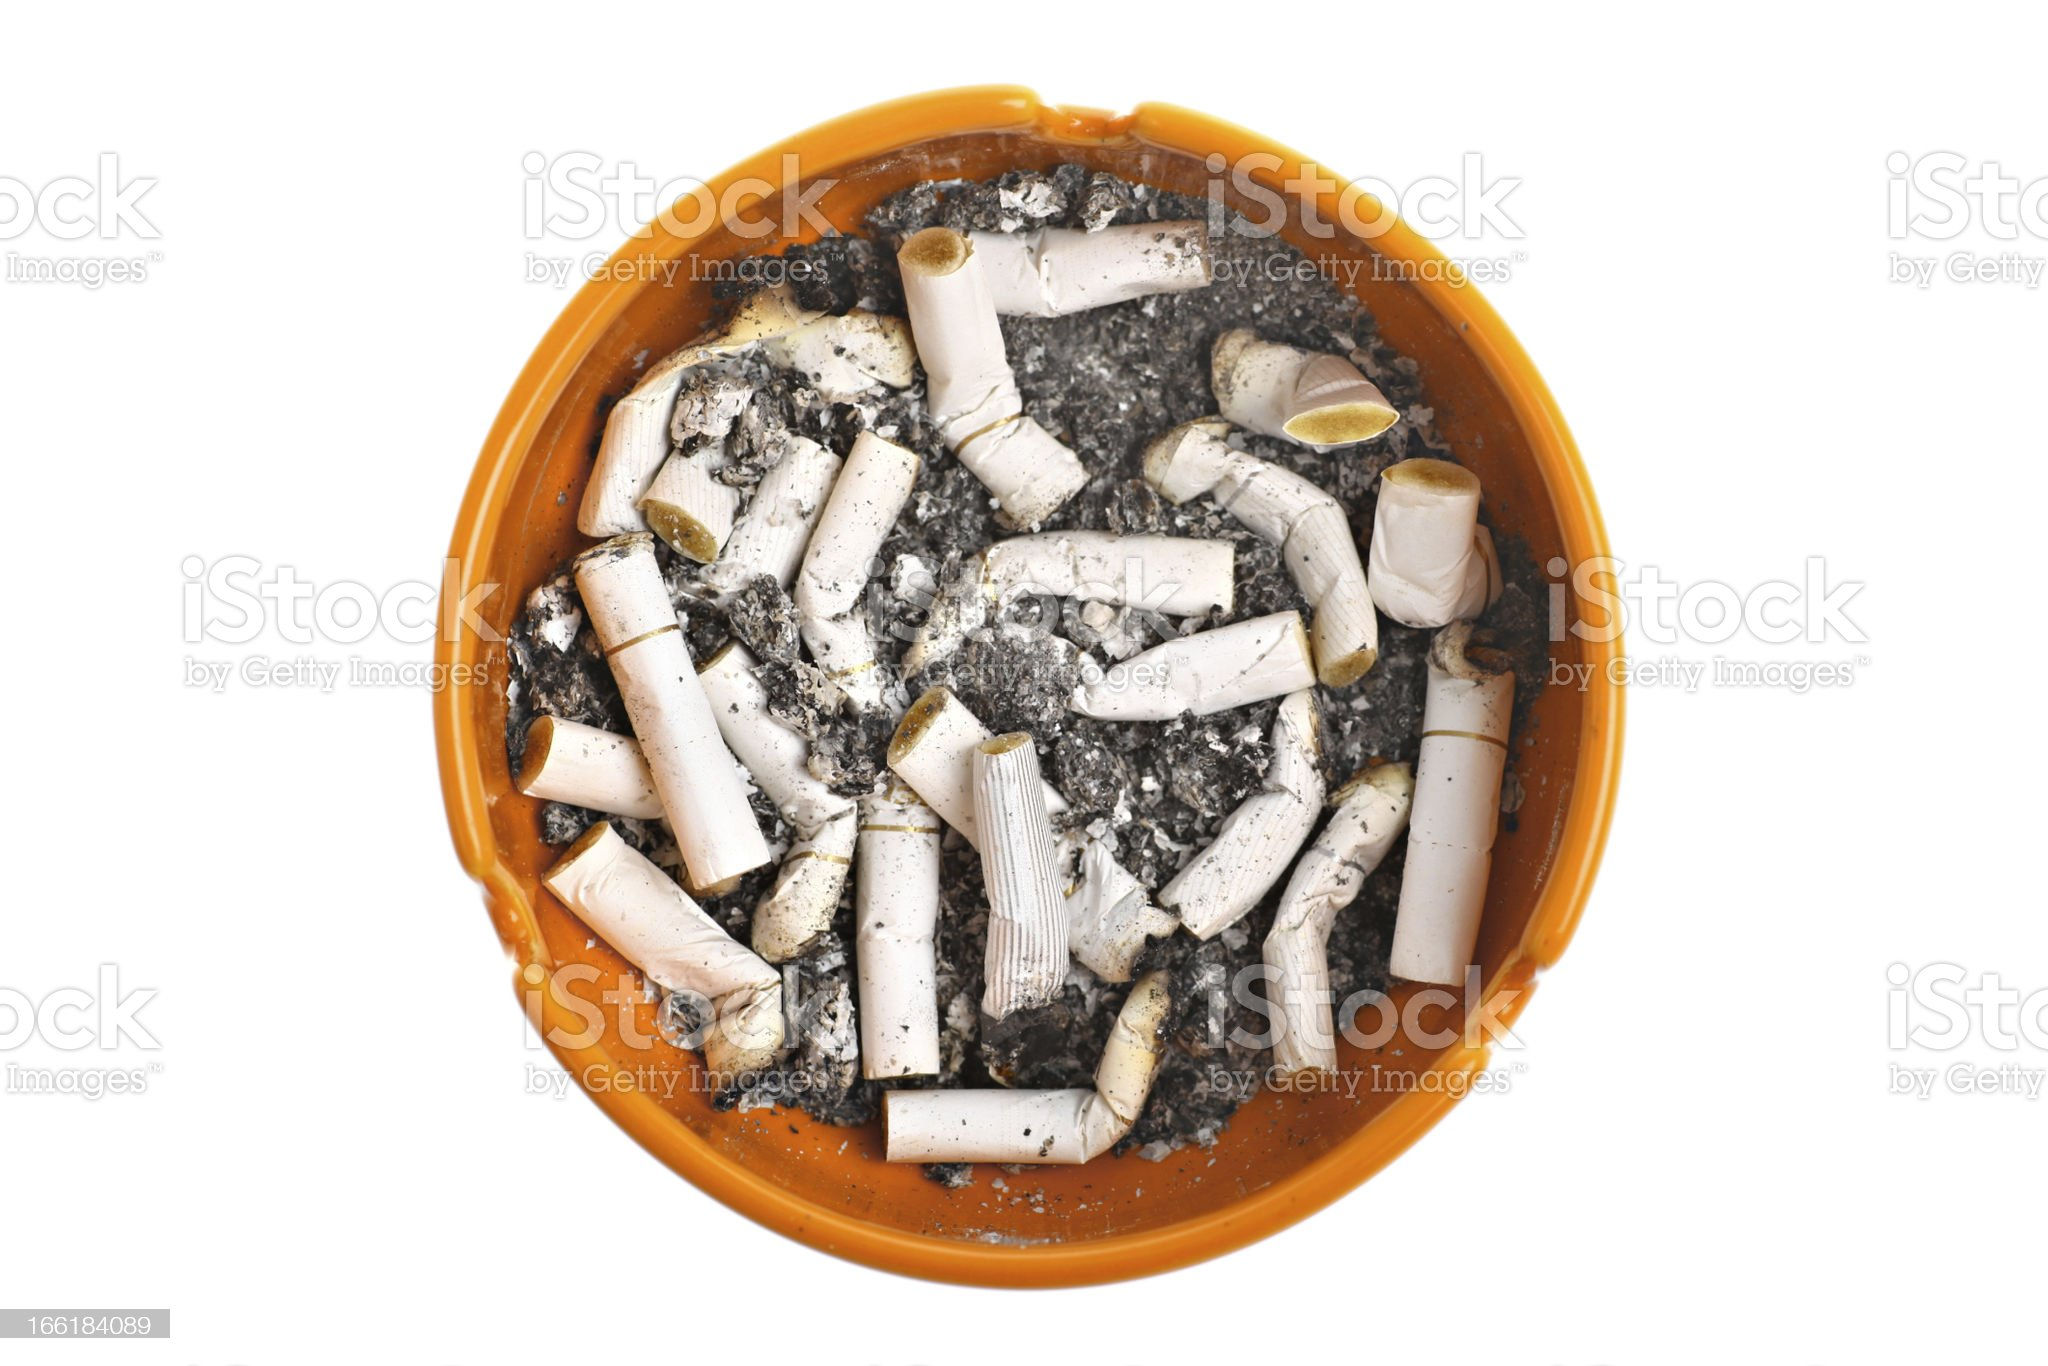 Ashtray and cigarettes royalty-free stock photo